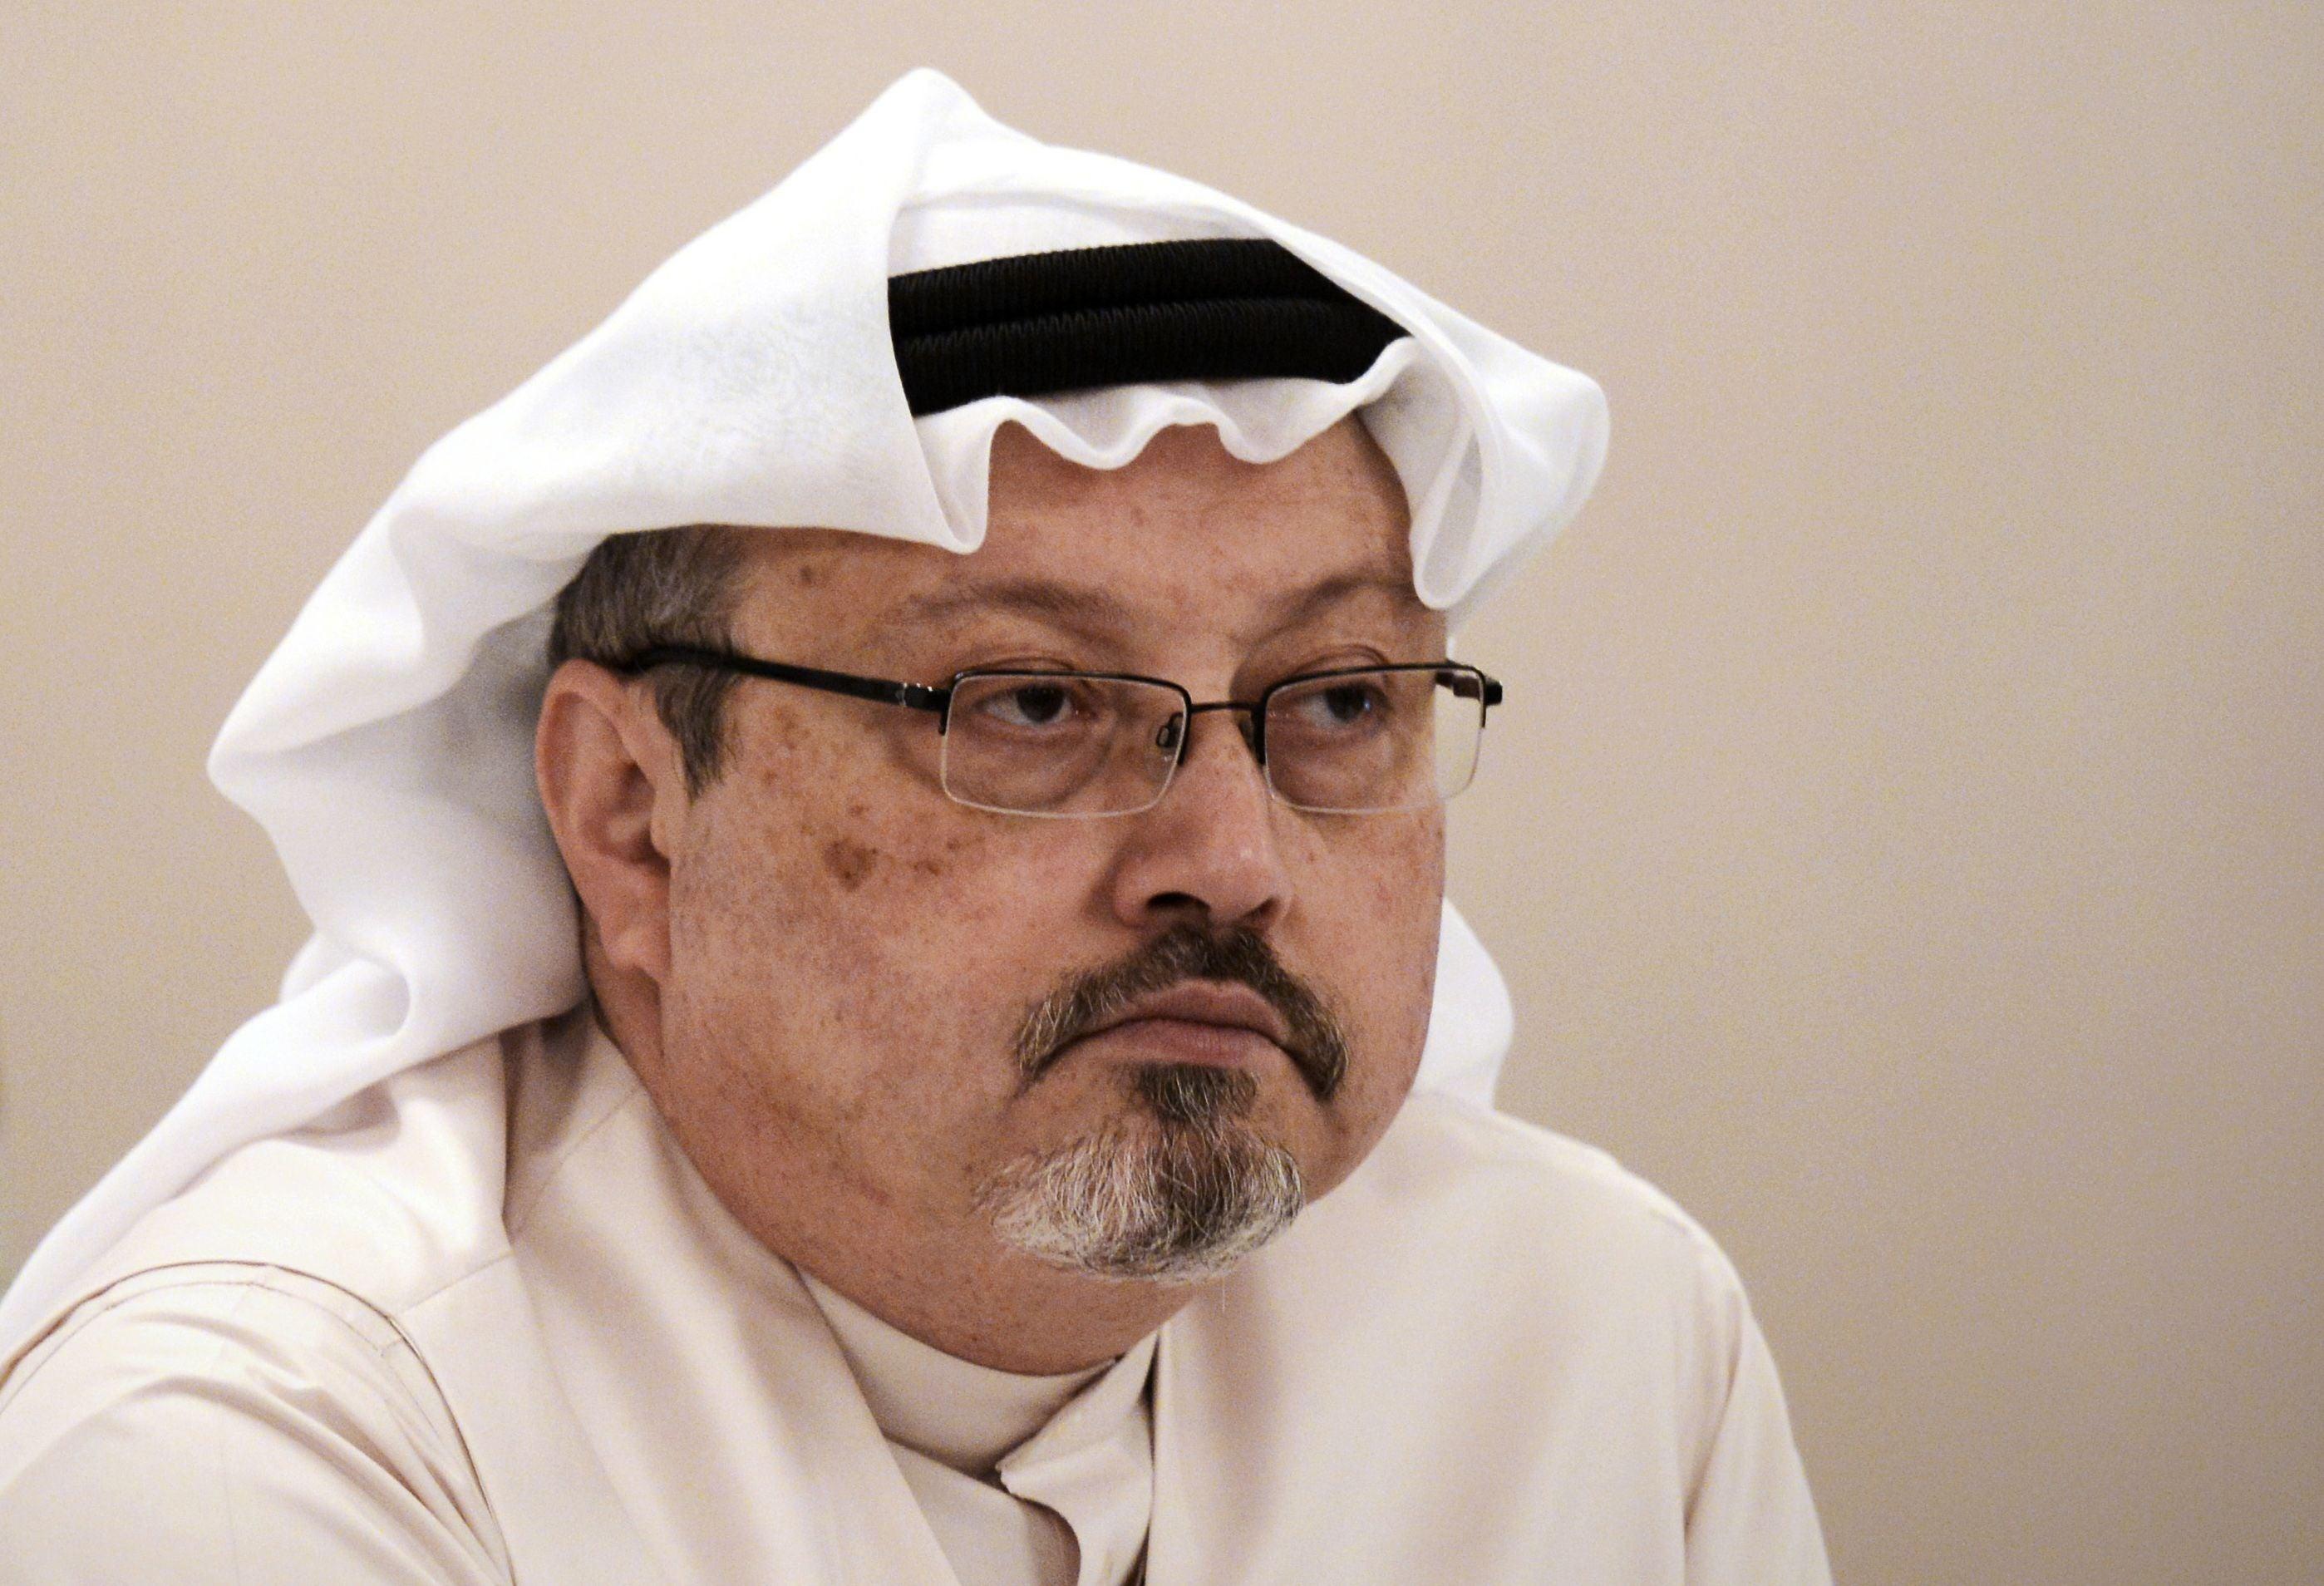 Jamal Khashoggi: Family of slain Saudi journalist sues Saudi Crown Prince - independent